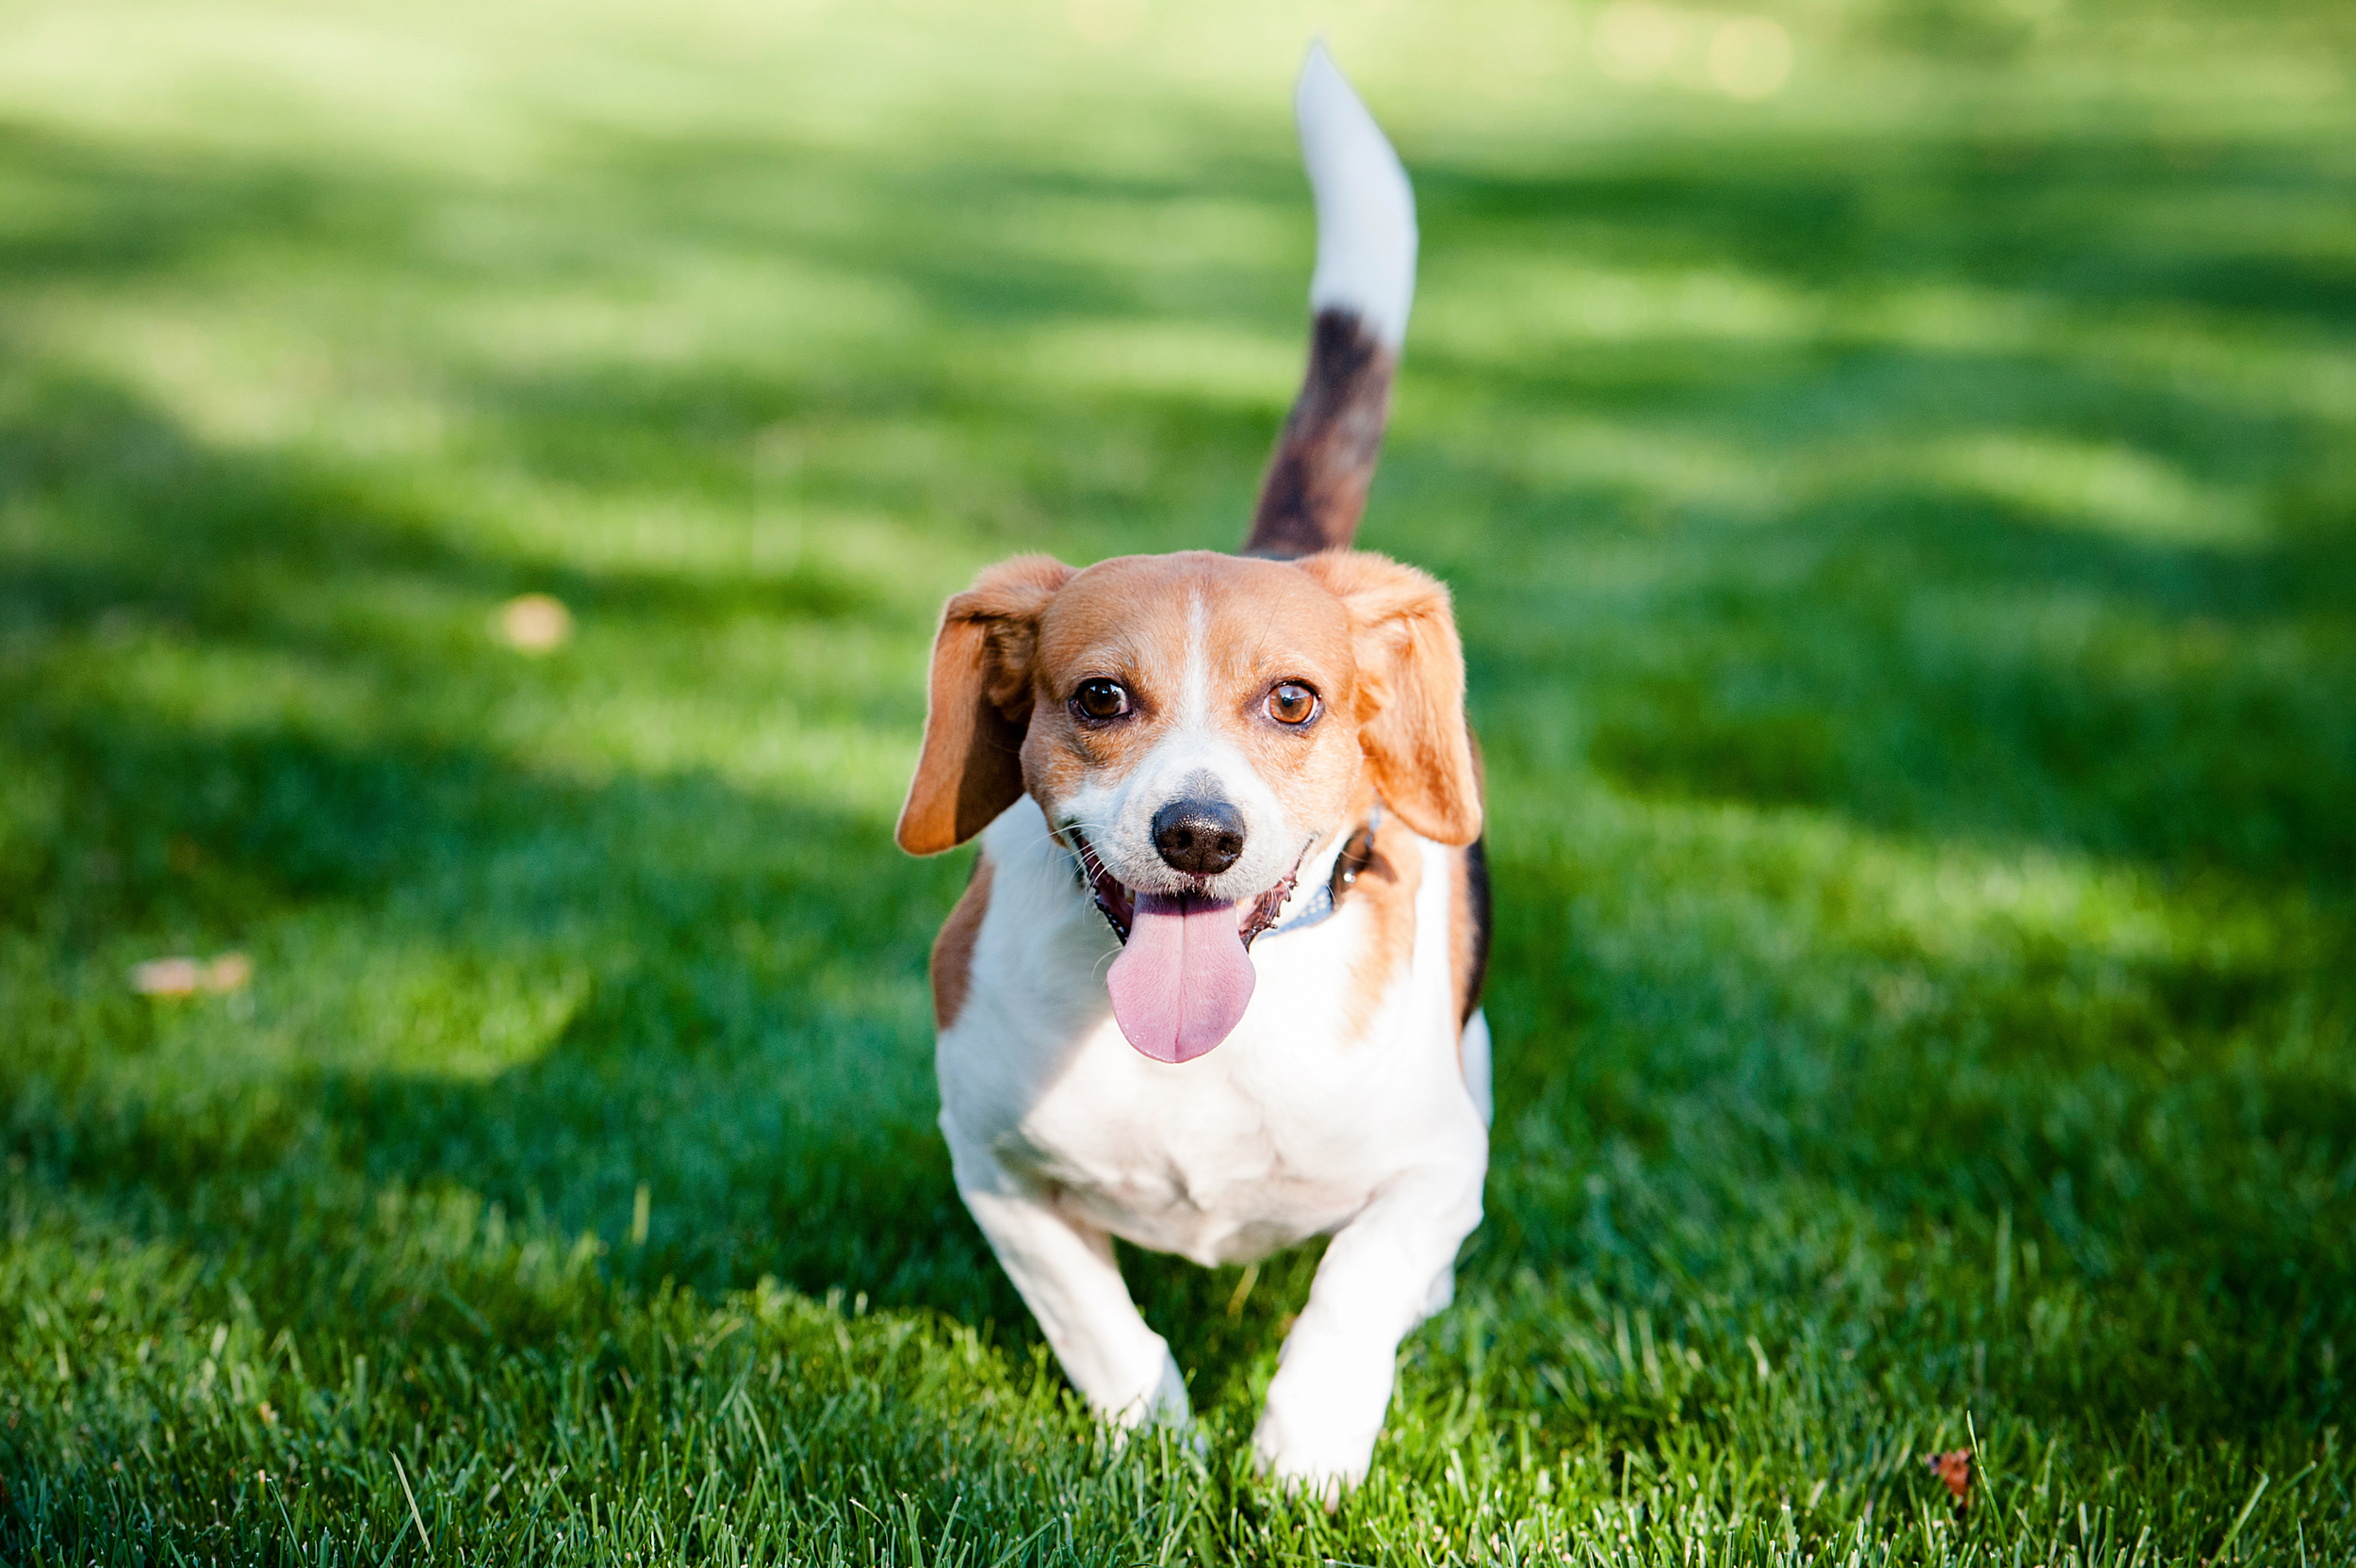 dexter jack-a-bee dog photography pittsburgh 003.jpg